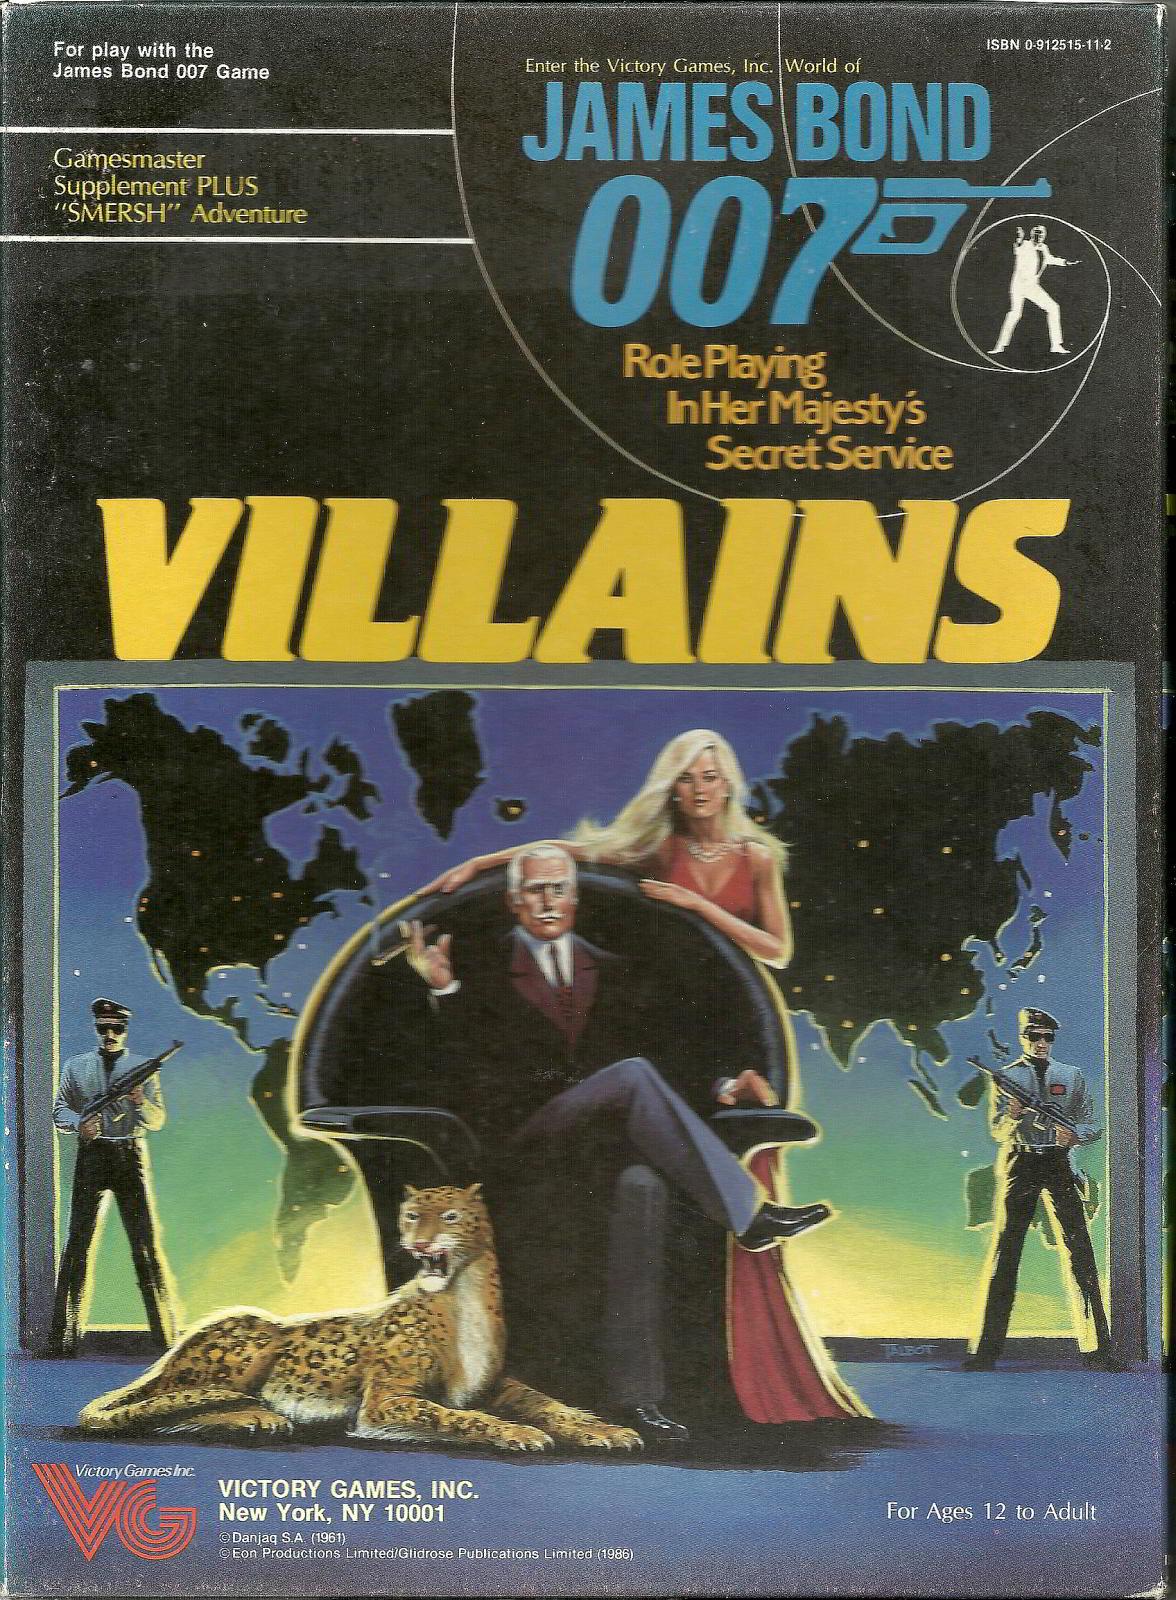 James Bond 007 Villains